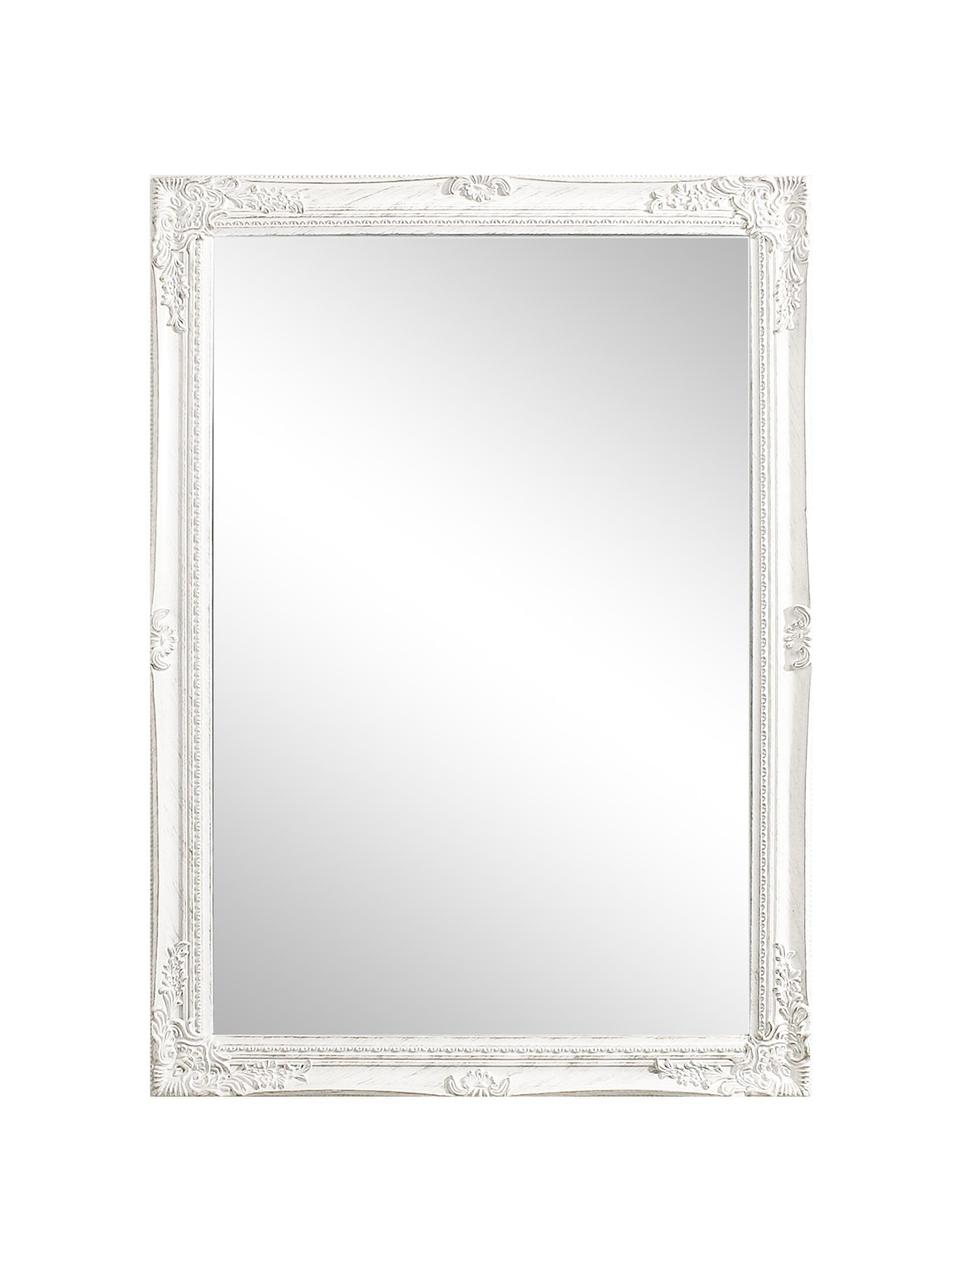 Rechthoekige wandspiegel Miro met witte houten lijst, Frame: gecoat hout, Wit, 72 x 102 cm